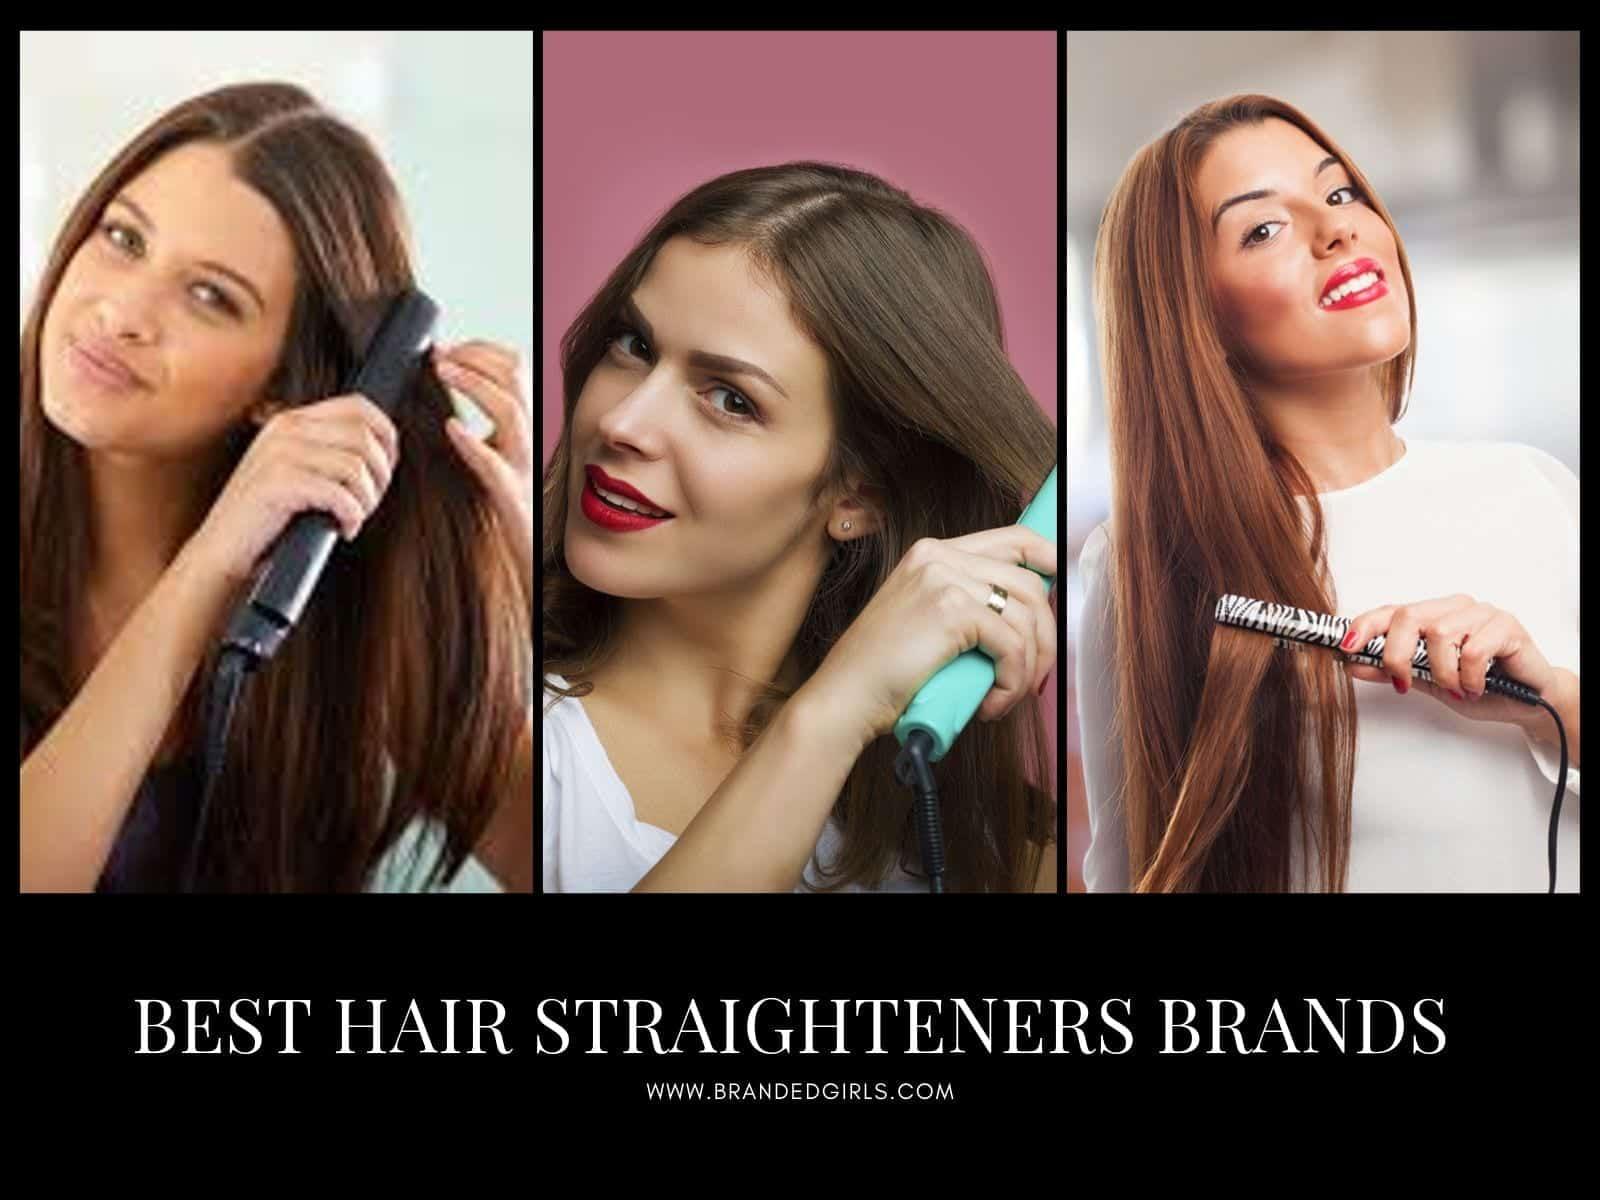 Hair-Straighteners-Brands-in-World Top 10 Hair Straighteners Brands in World 2019